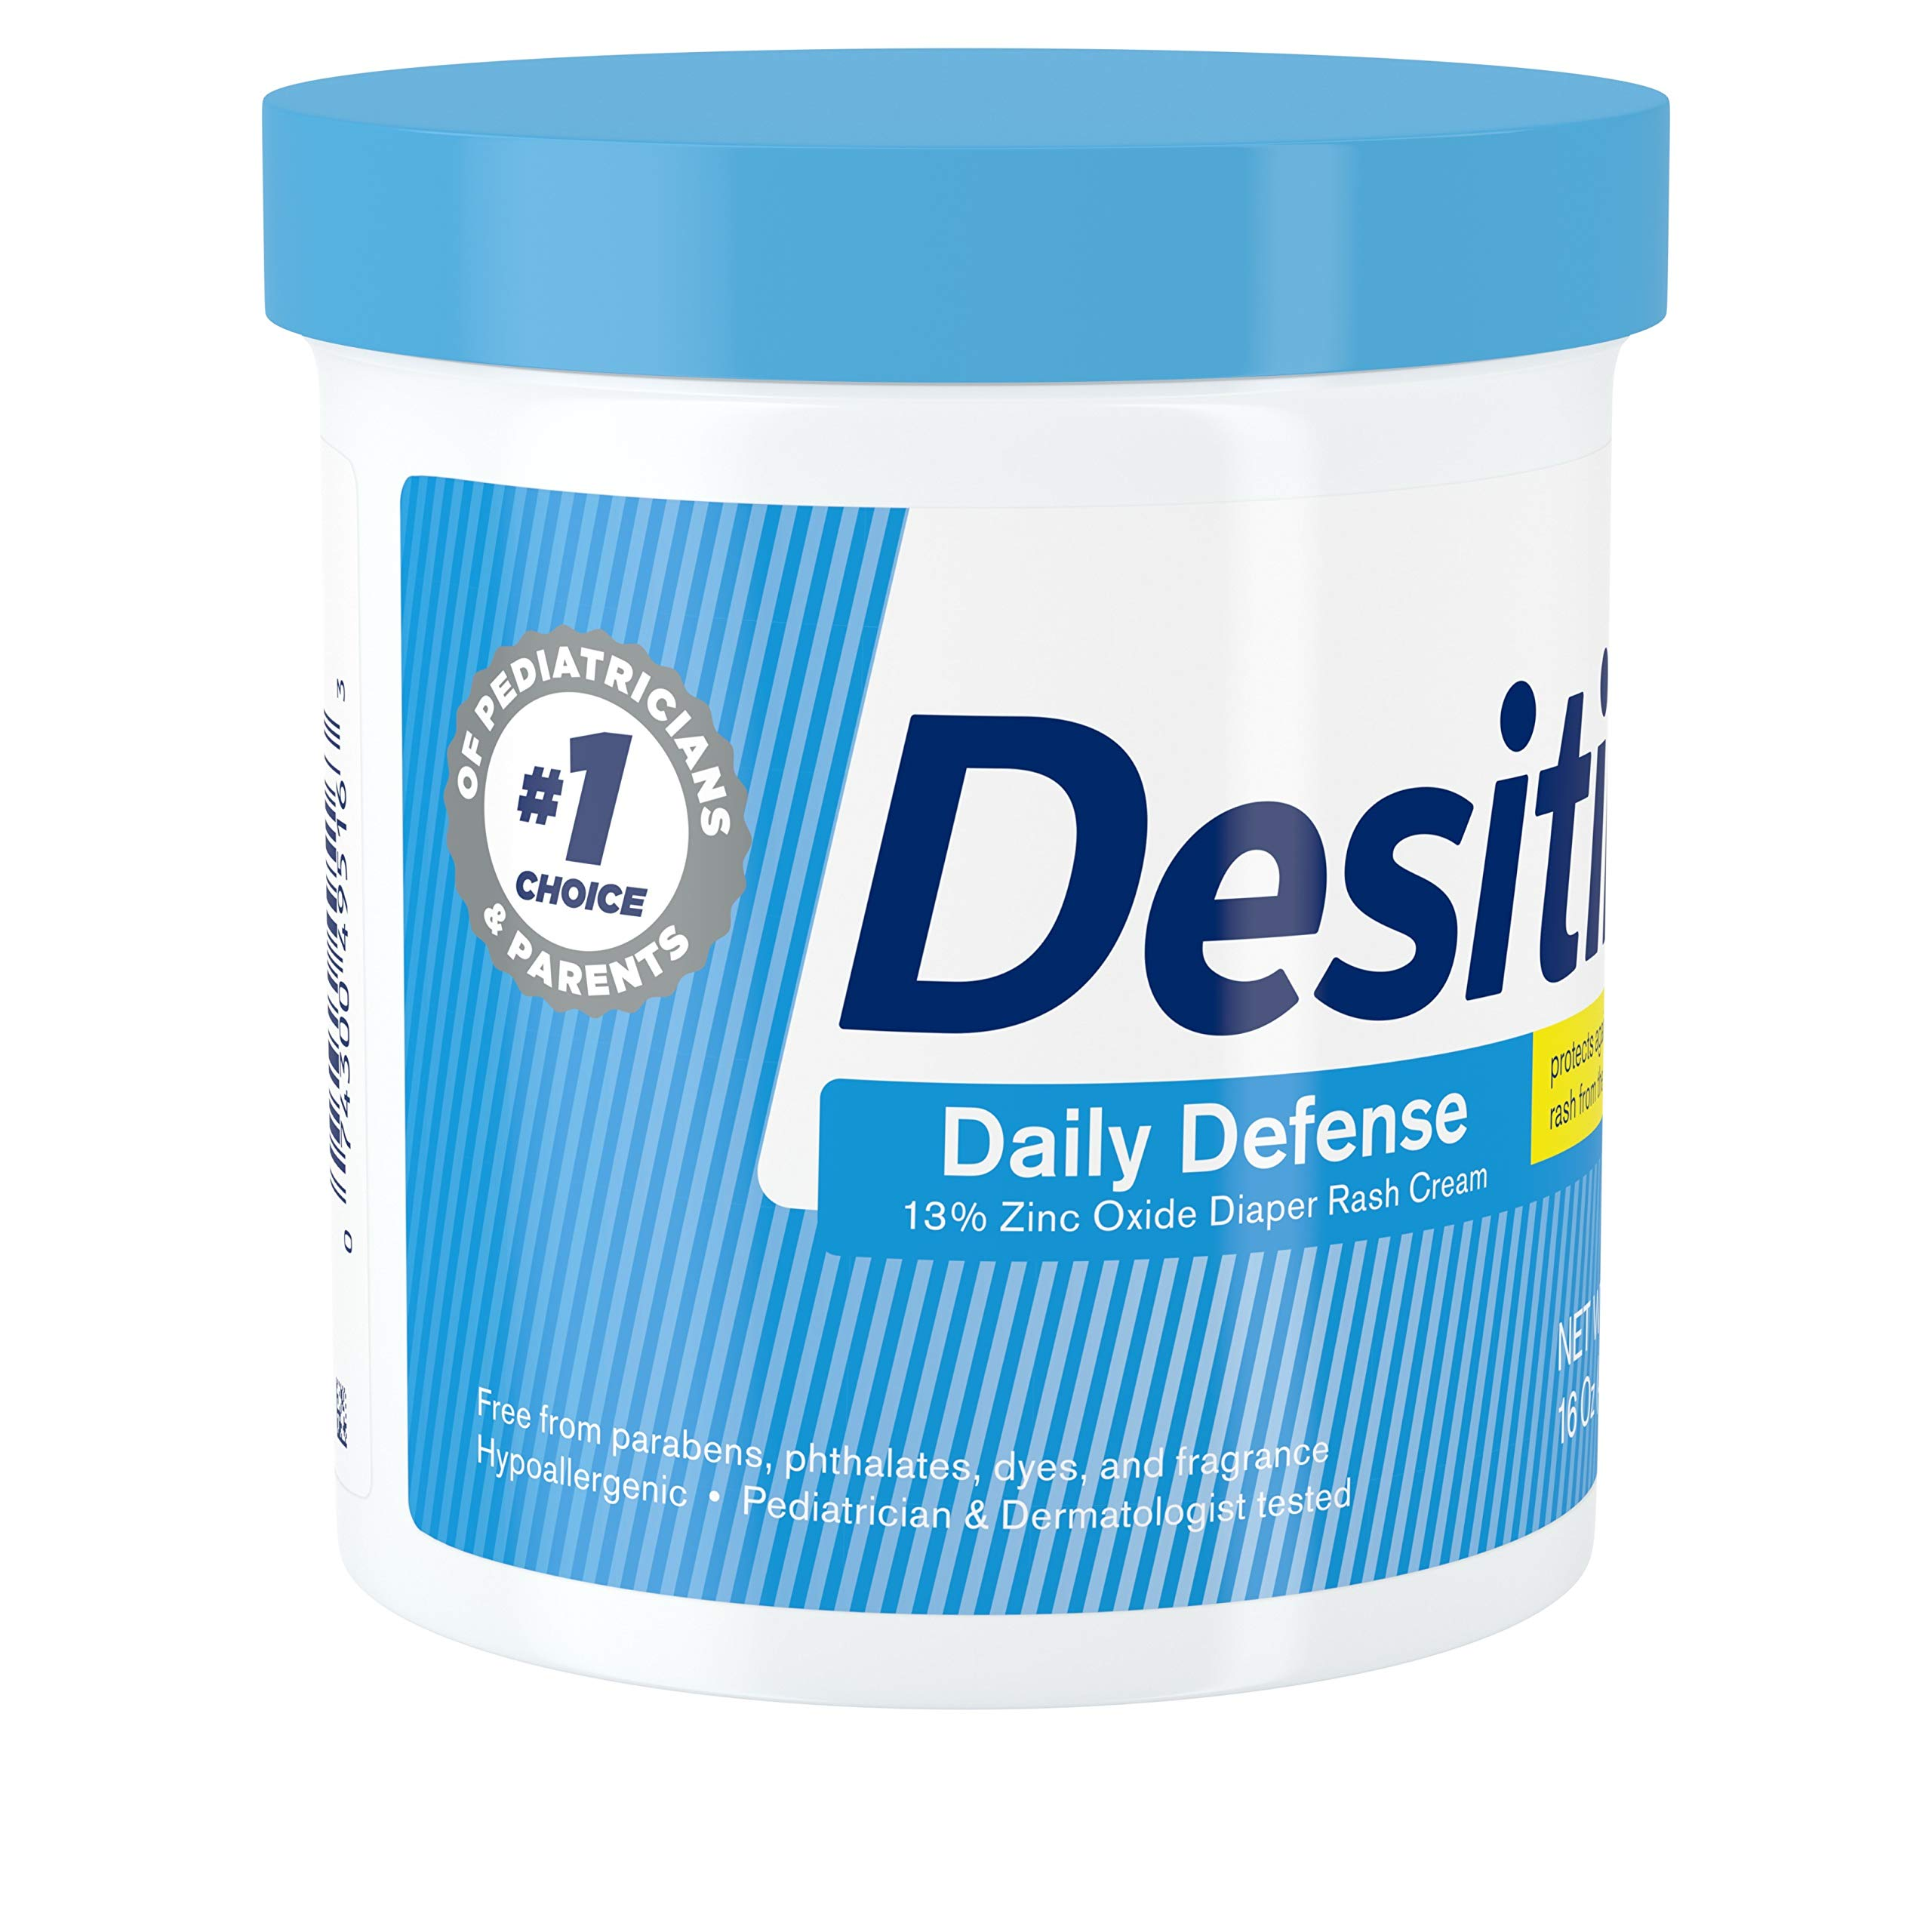 Desitin Daily Defense Baby Diaper Rash Cream with Zinc Oxide to Treat, Relieve & Prevent diaper rash, 16 oz by Desitin (Image #5)